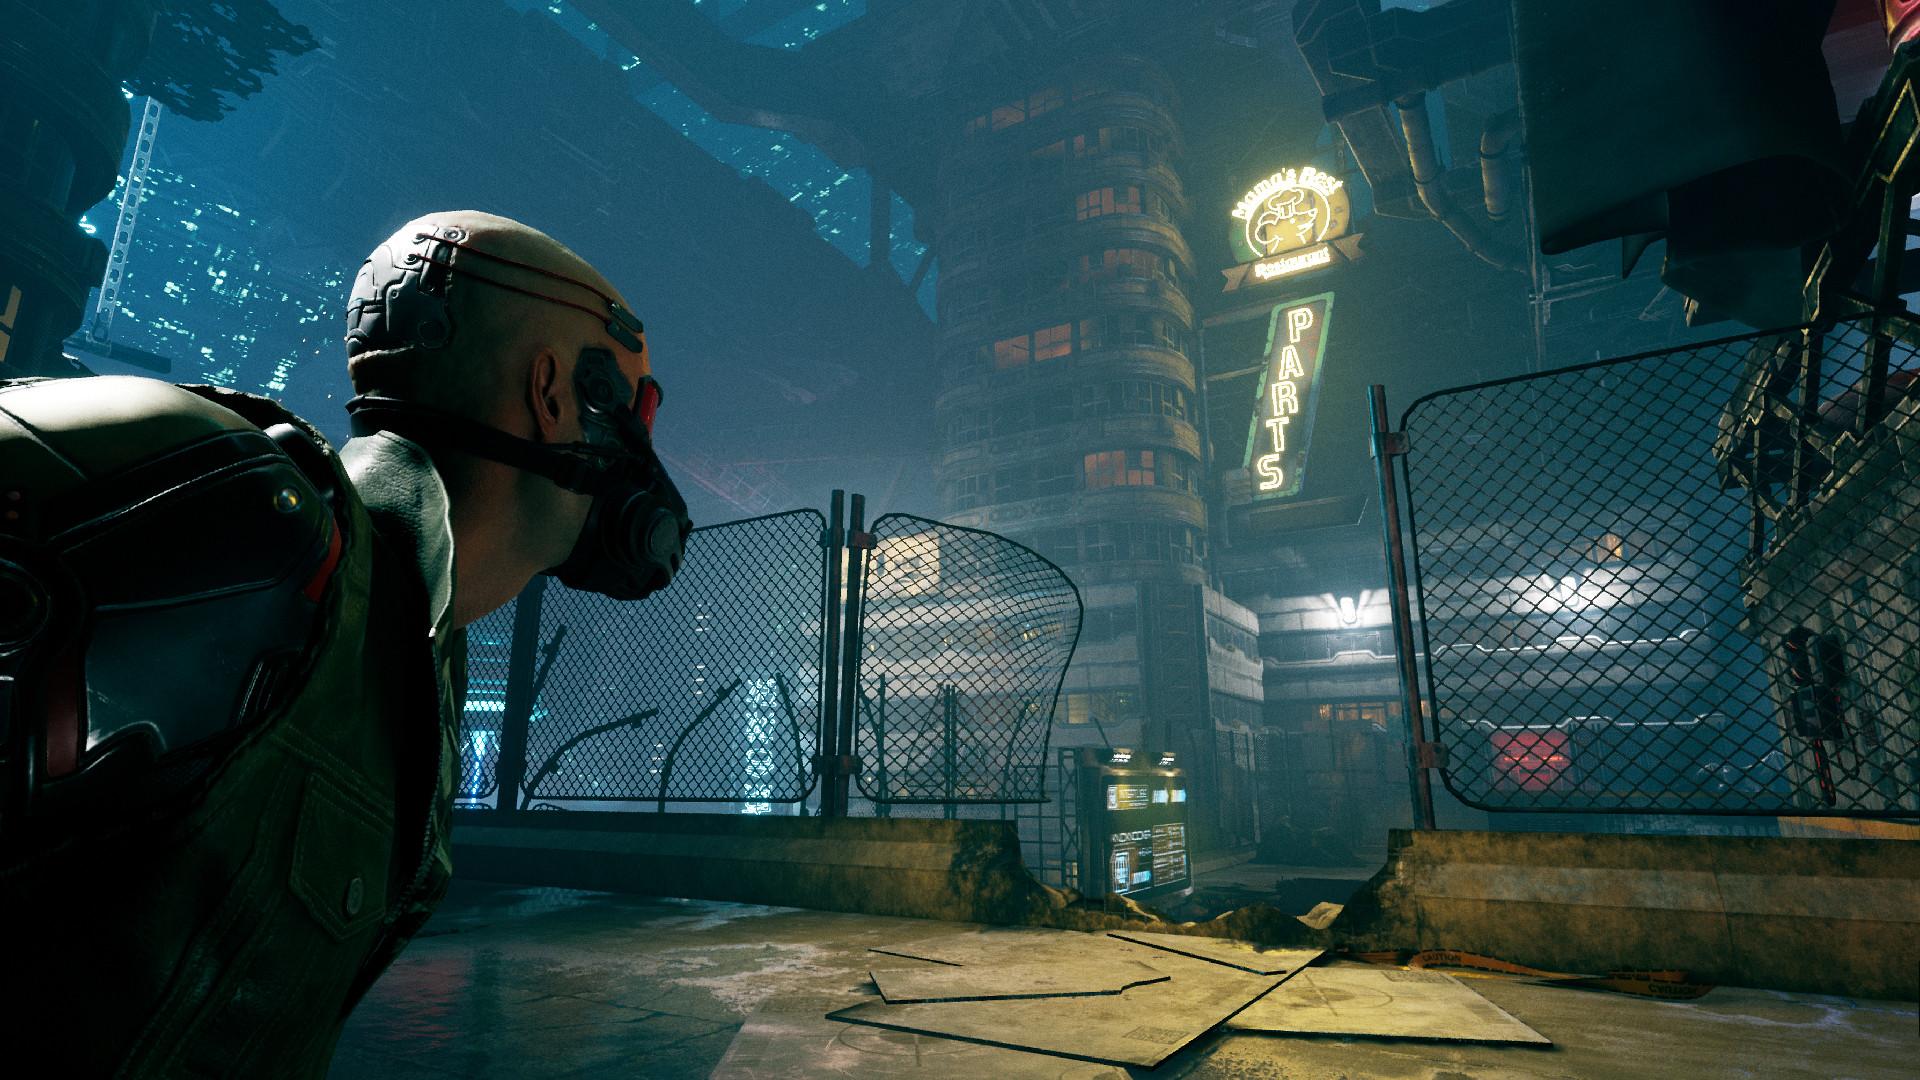 2020年的PC游戏-Ghostrunner